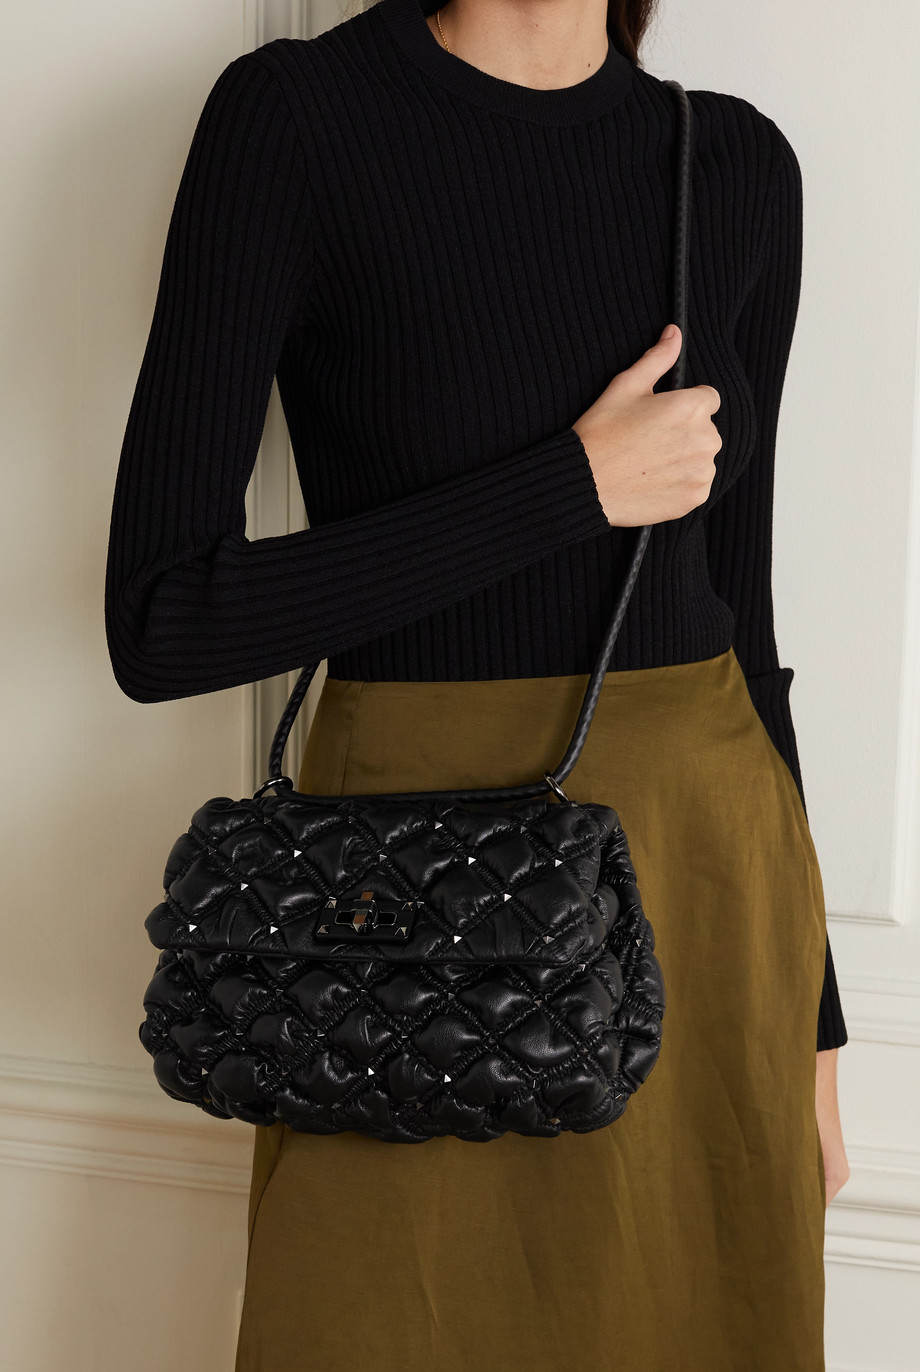 Valentino Valentino Garavani Waffle medium studded quilted leather shoulder bag